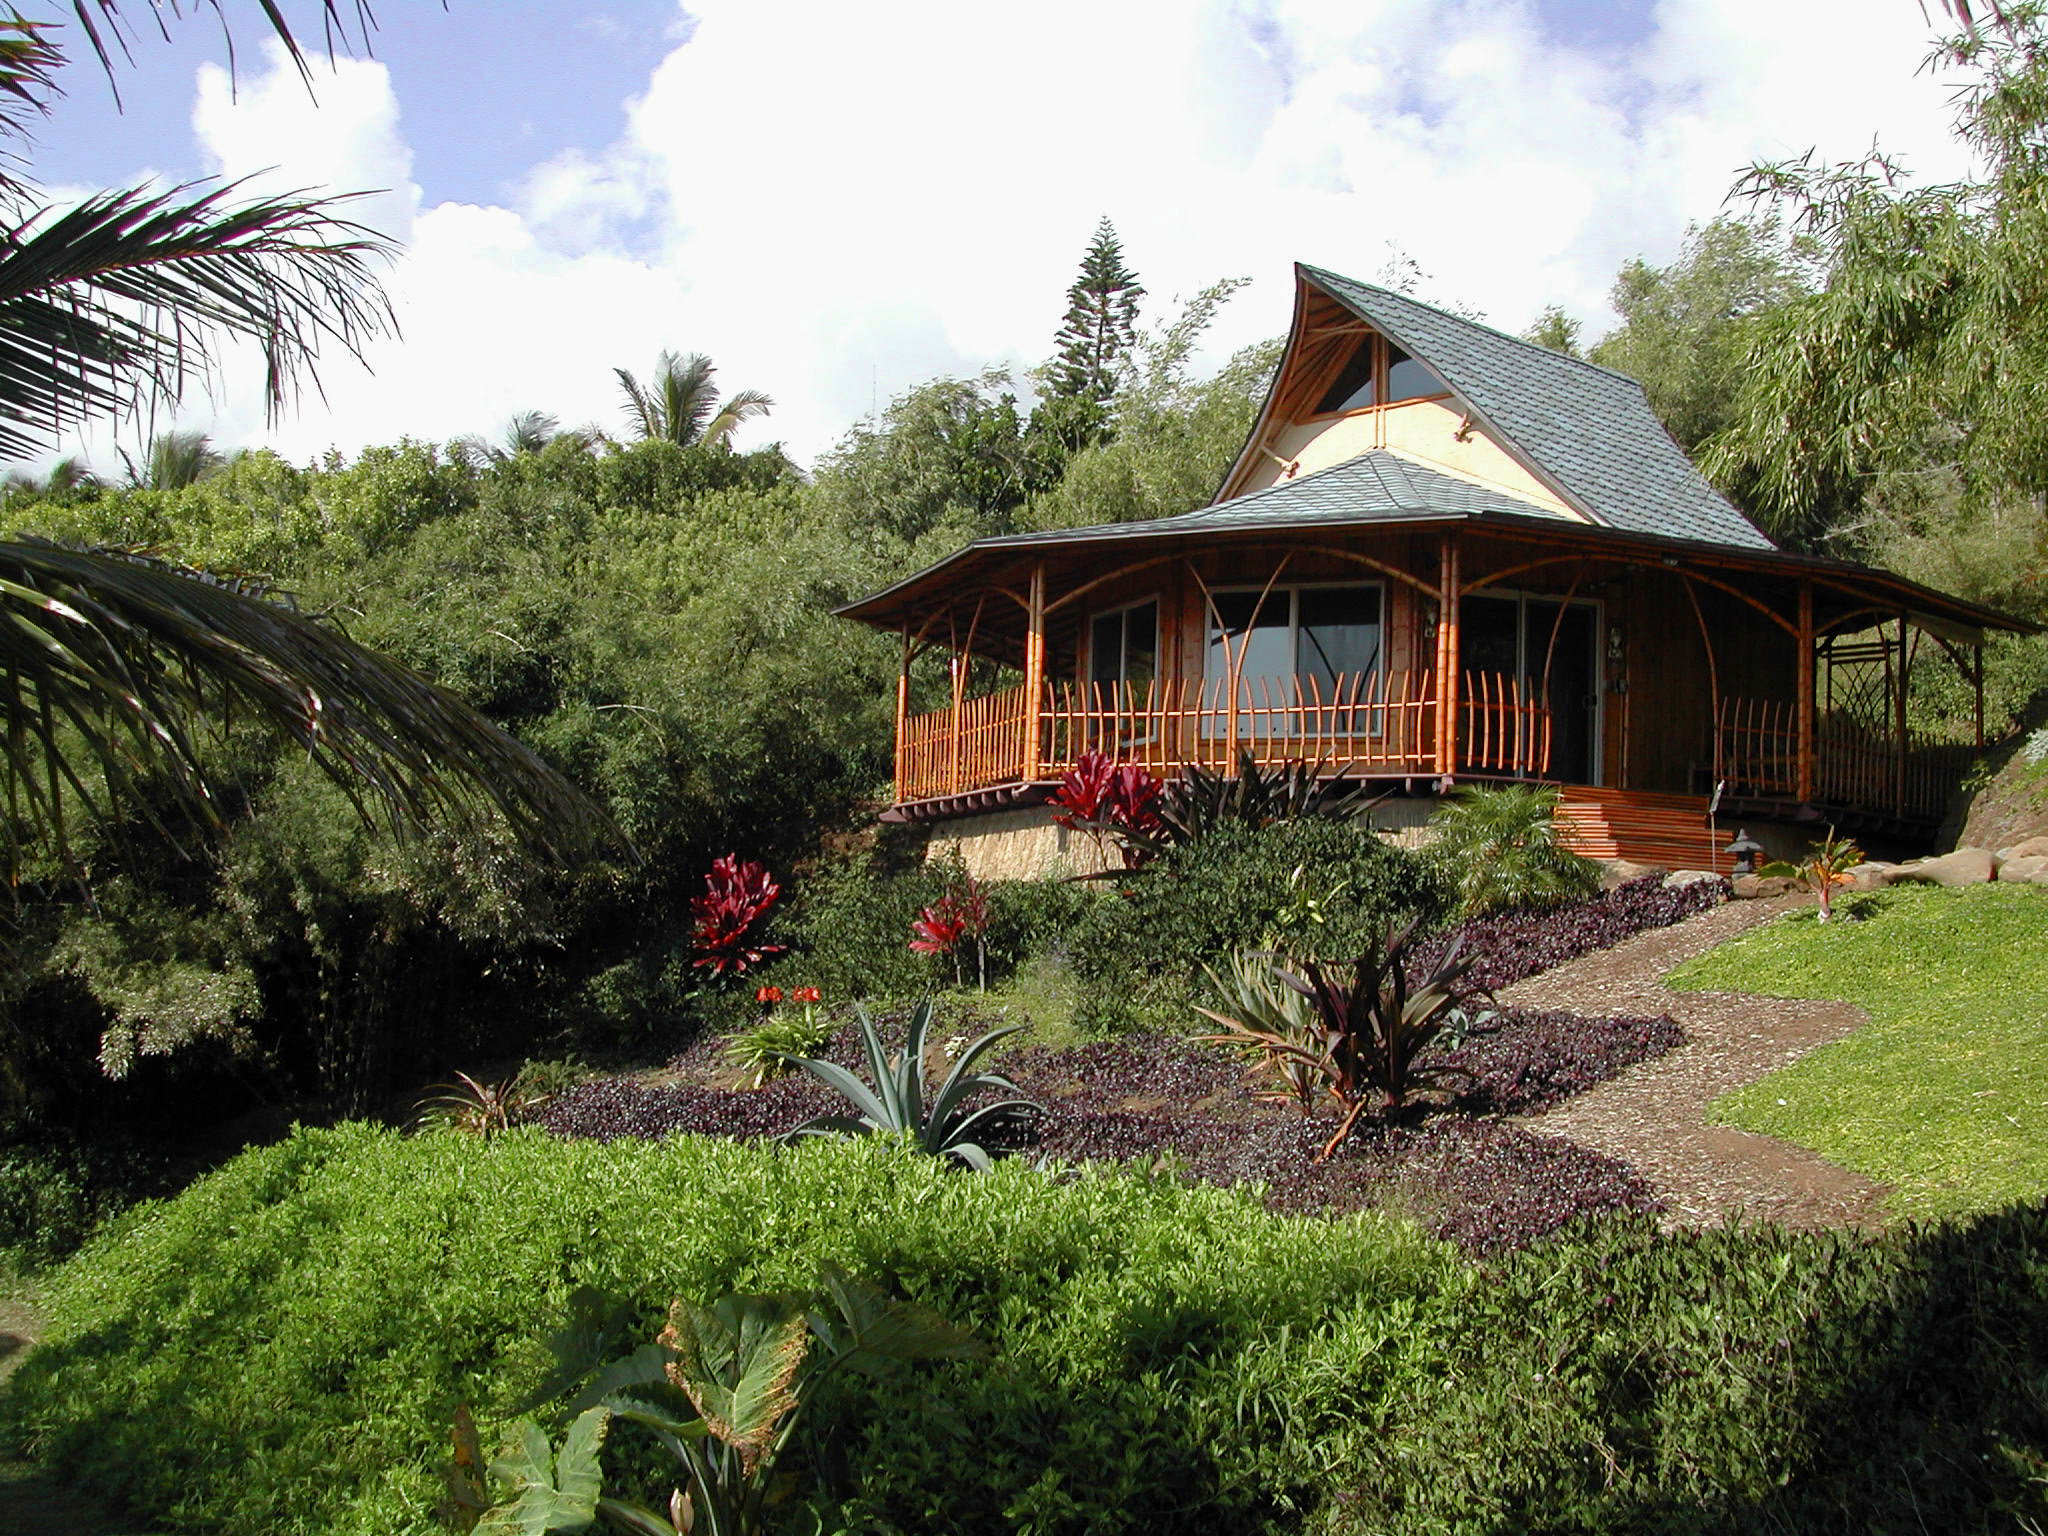 The Pacific Fijian home built for Kutira Decosterd on Maui.